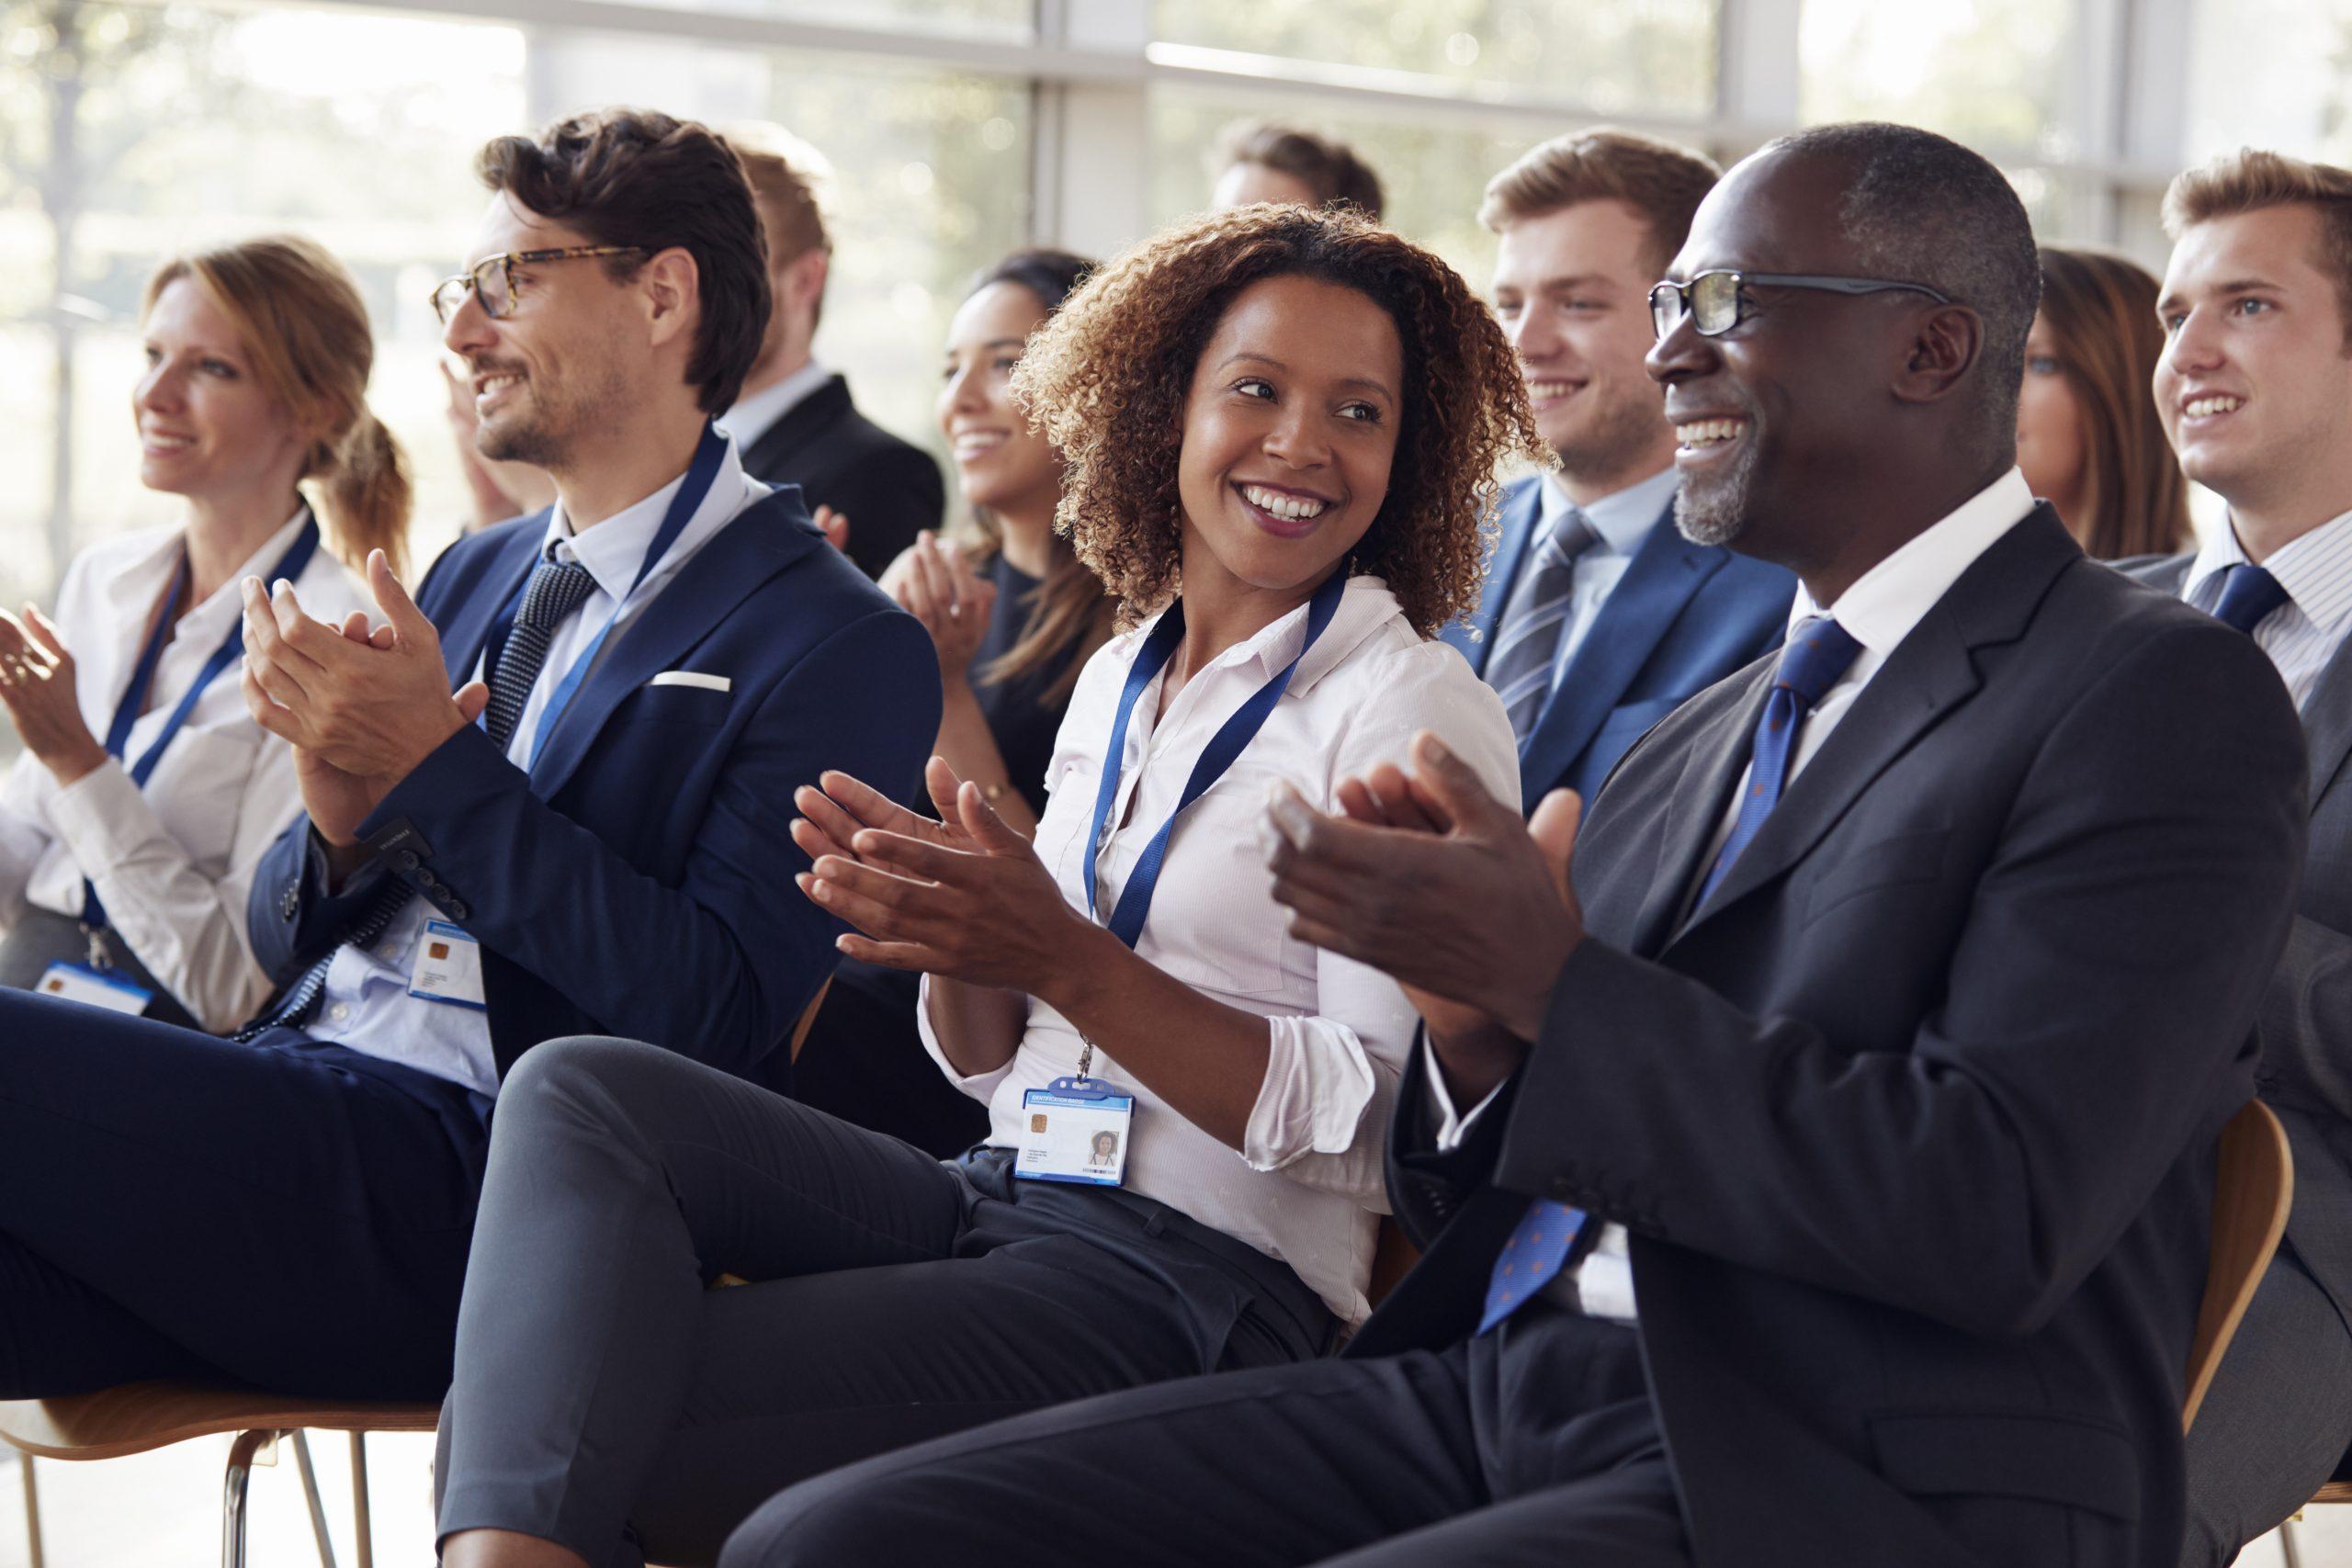 Smiling audience applauding at an attorneys seminar